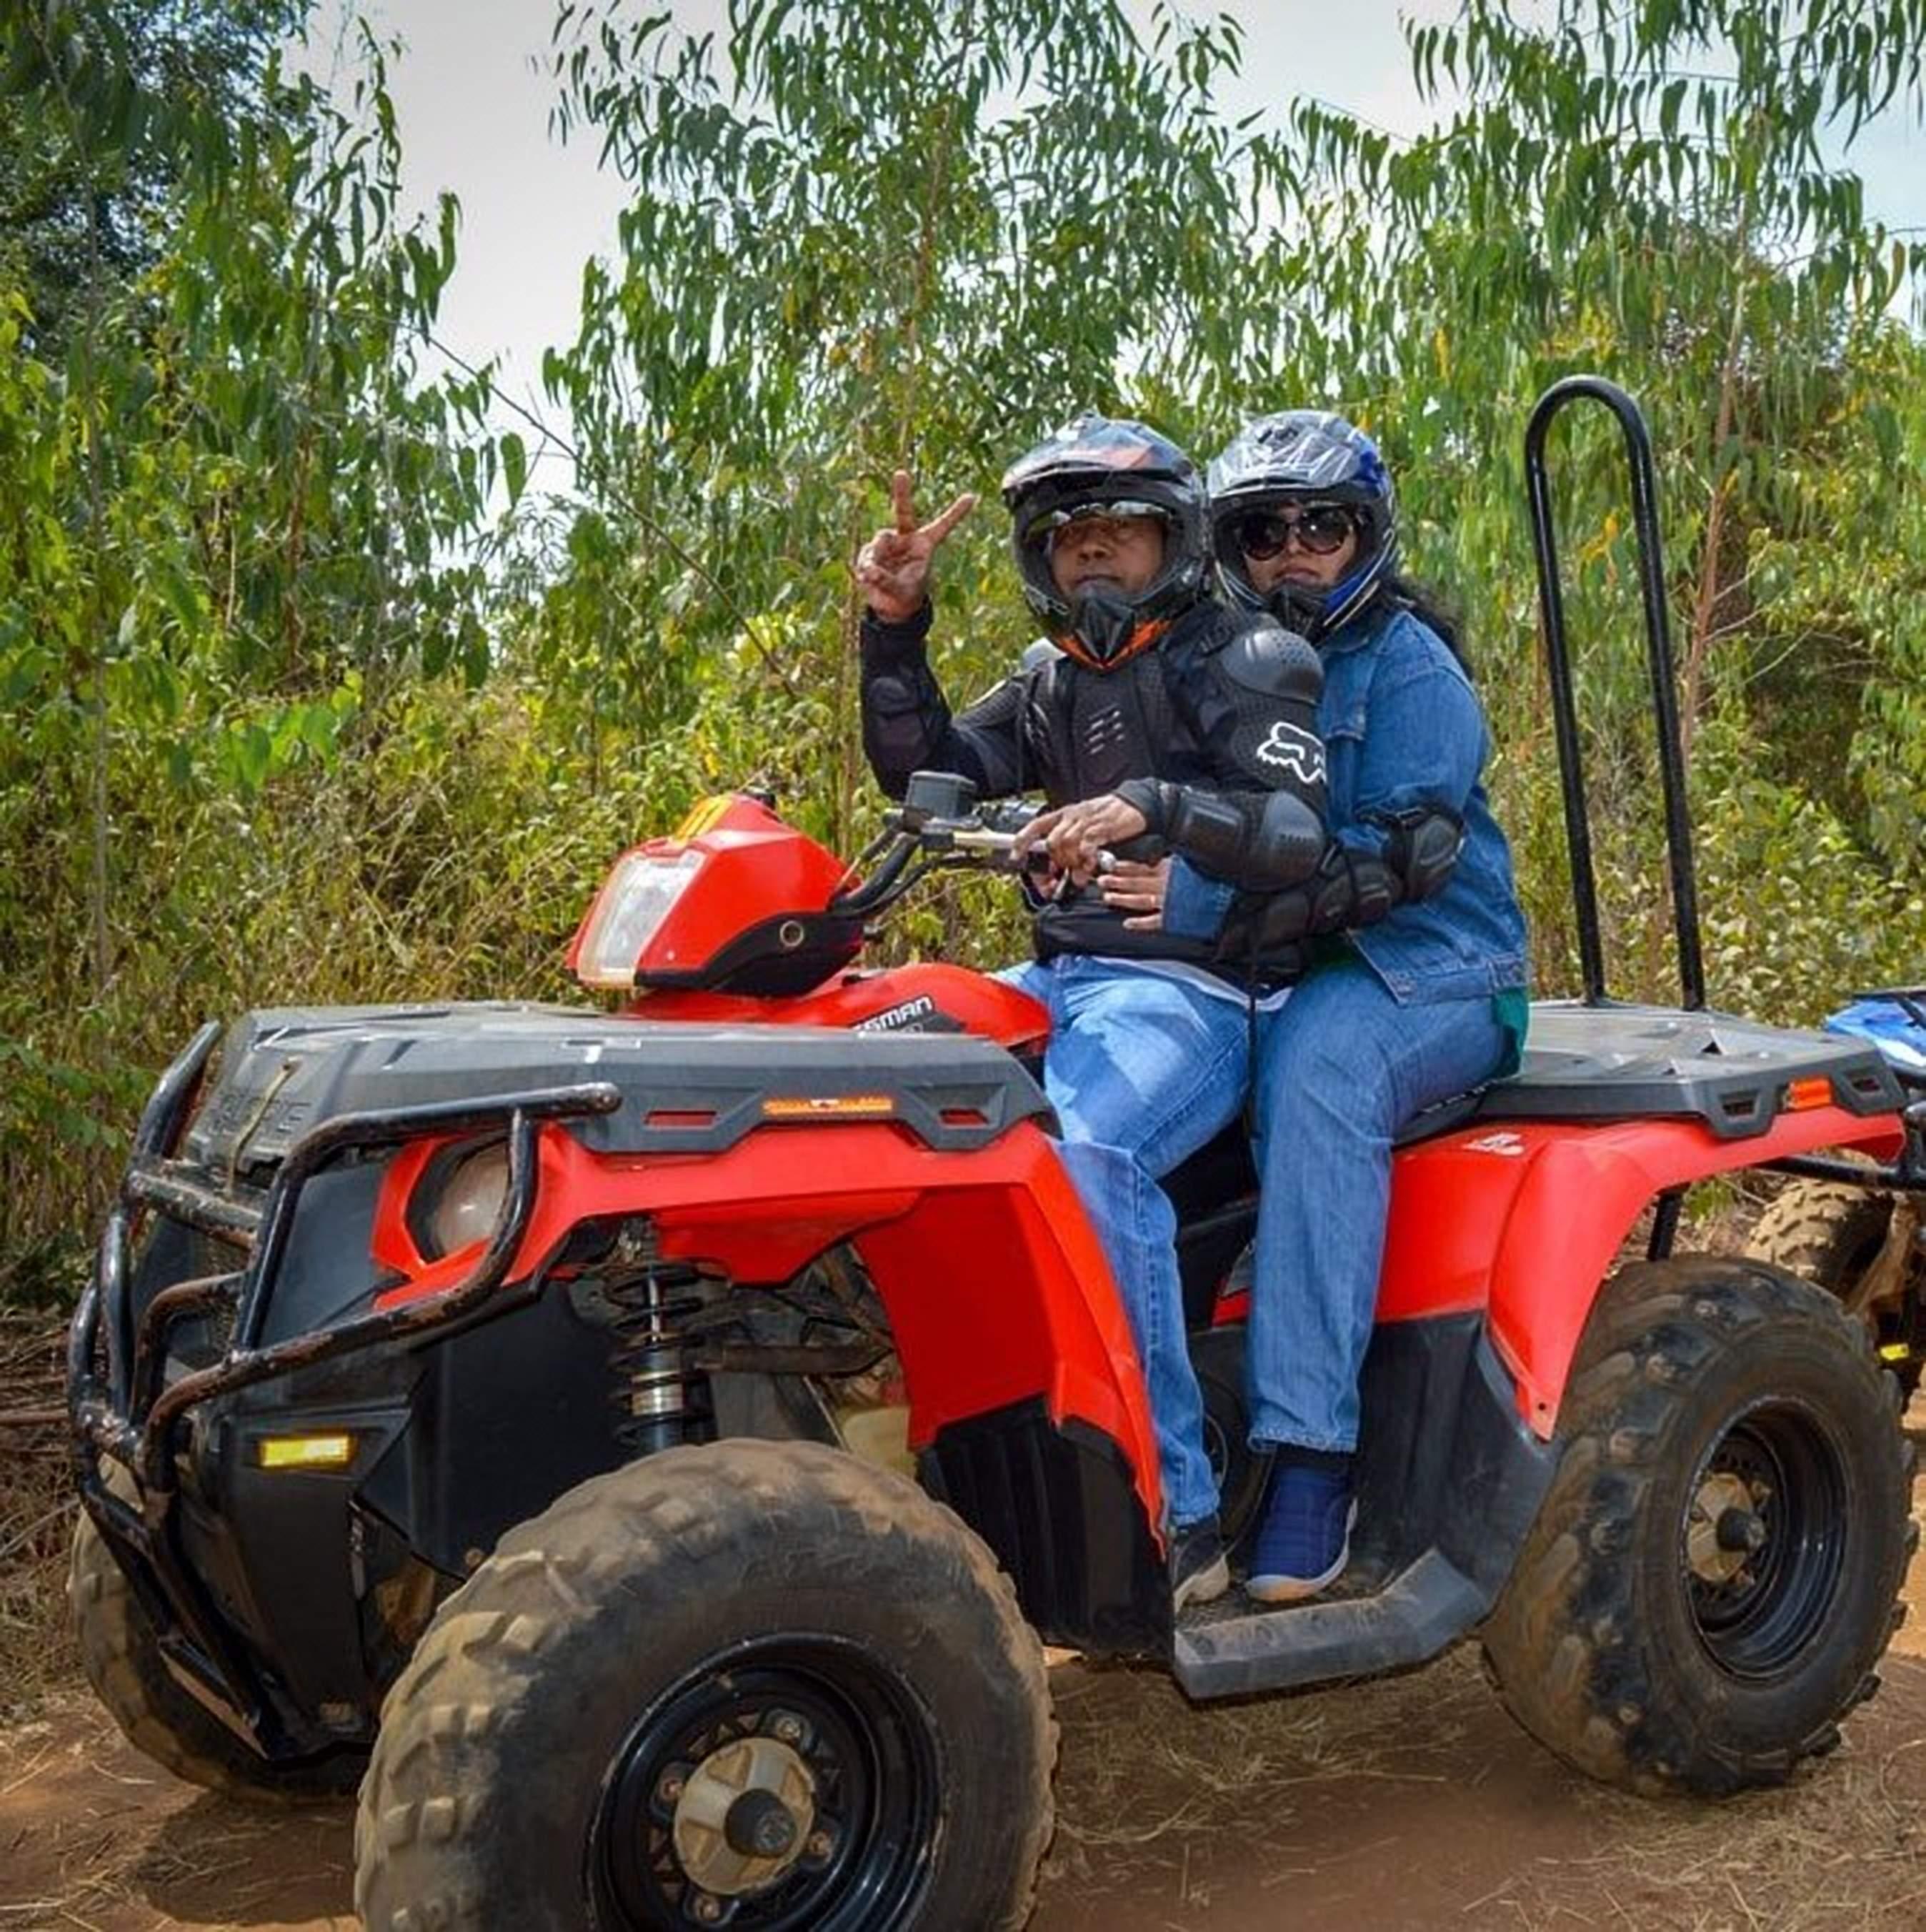 Sandy and Vyjay riding an ATV at Dirt Mania